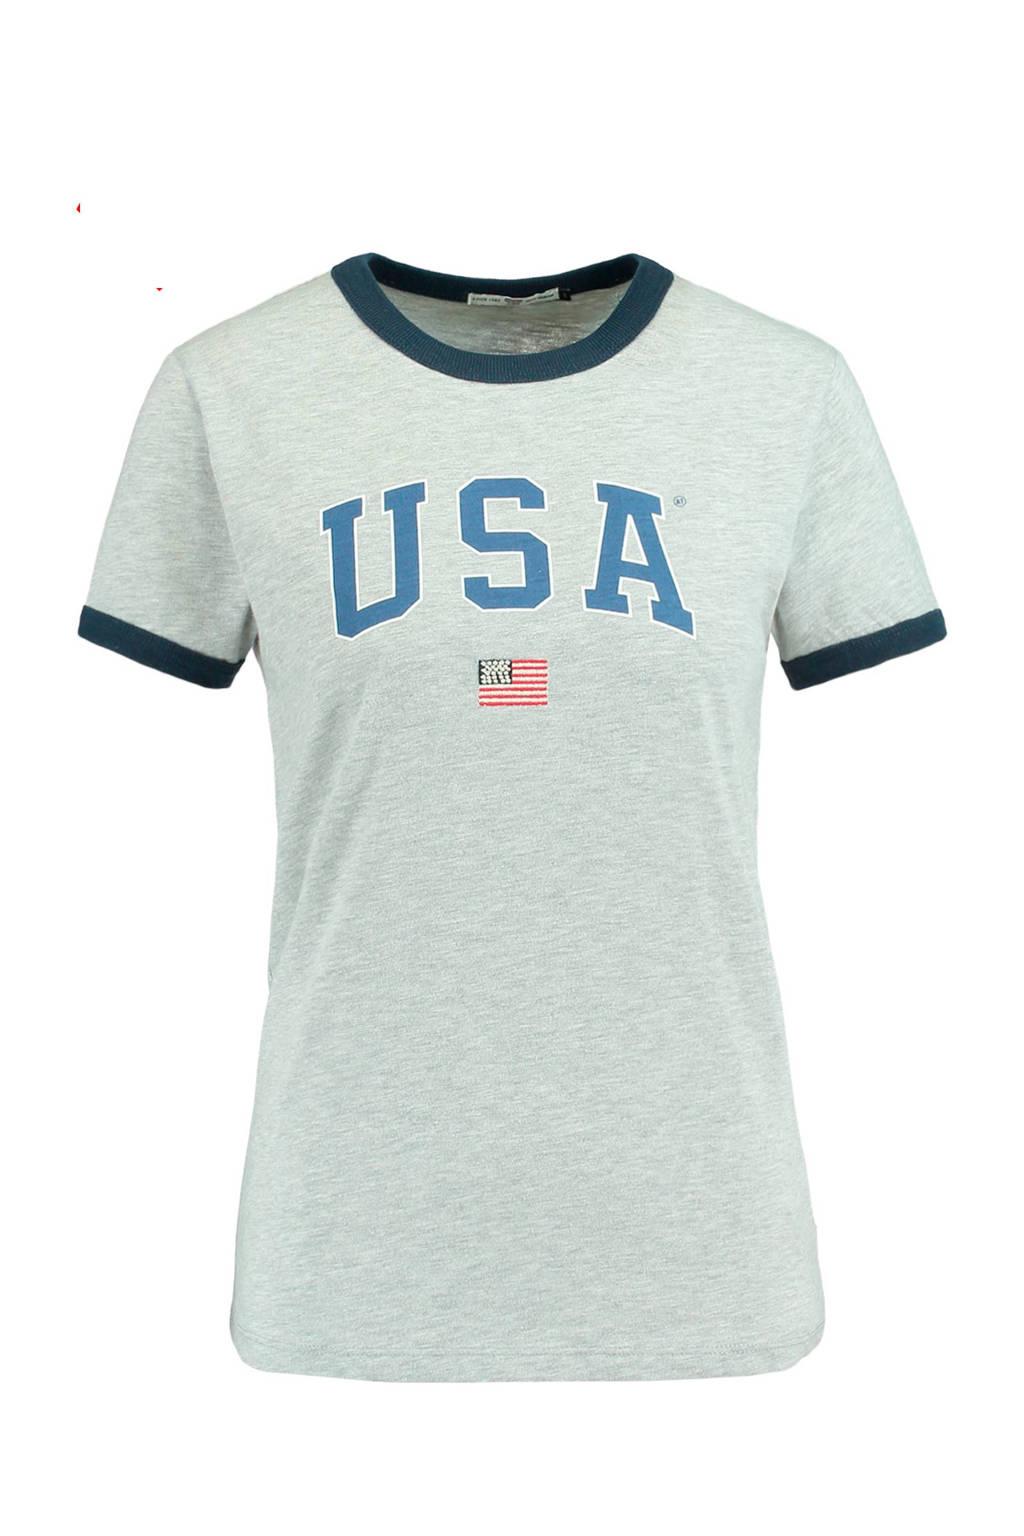 America Today T-shirt, Grijs melange